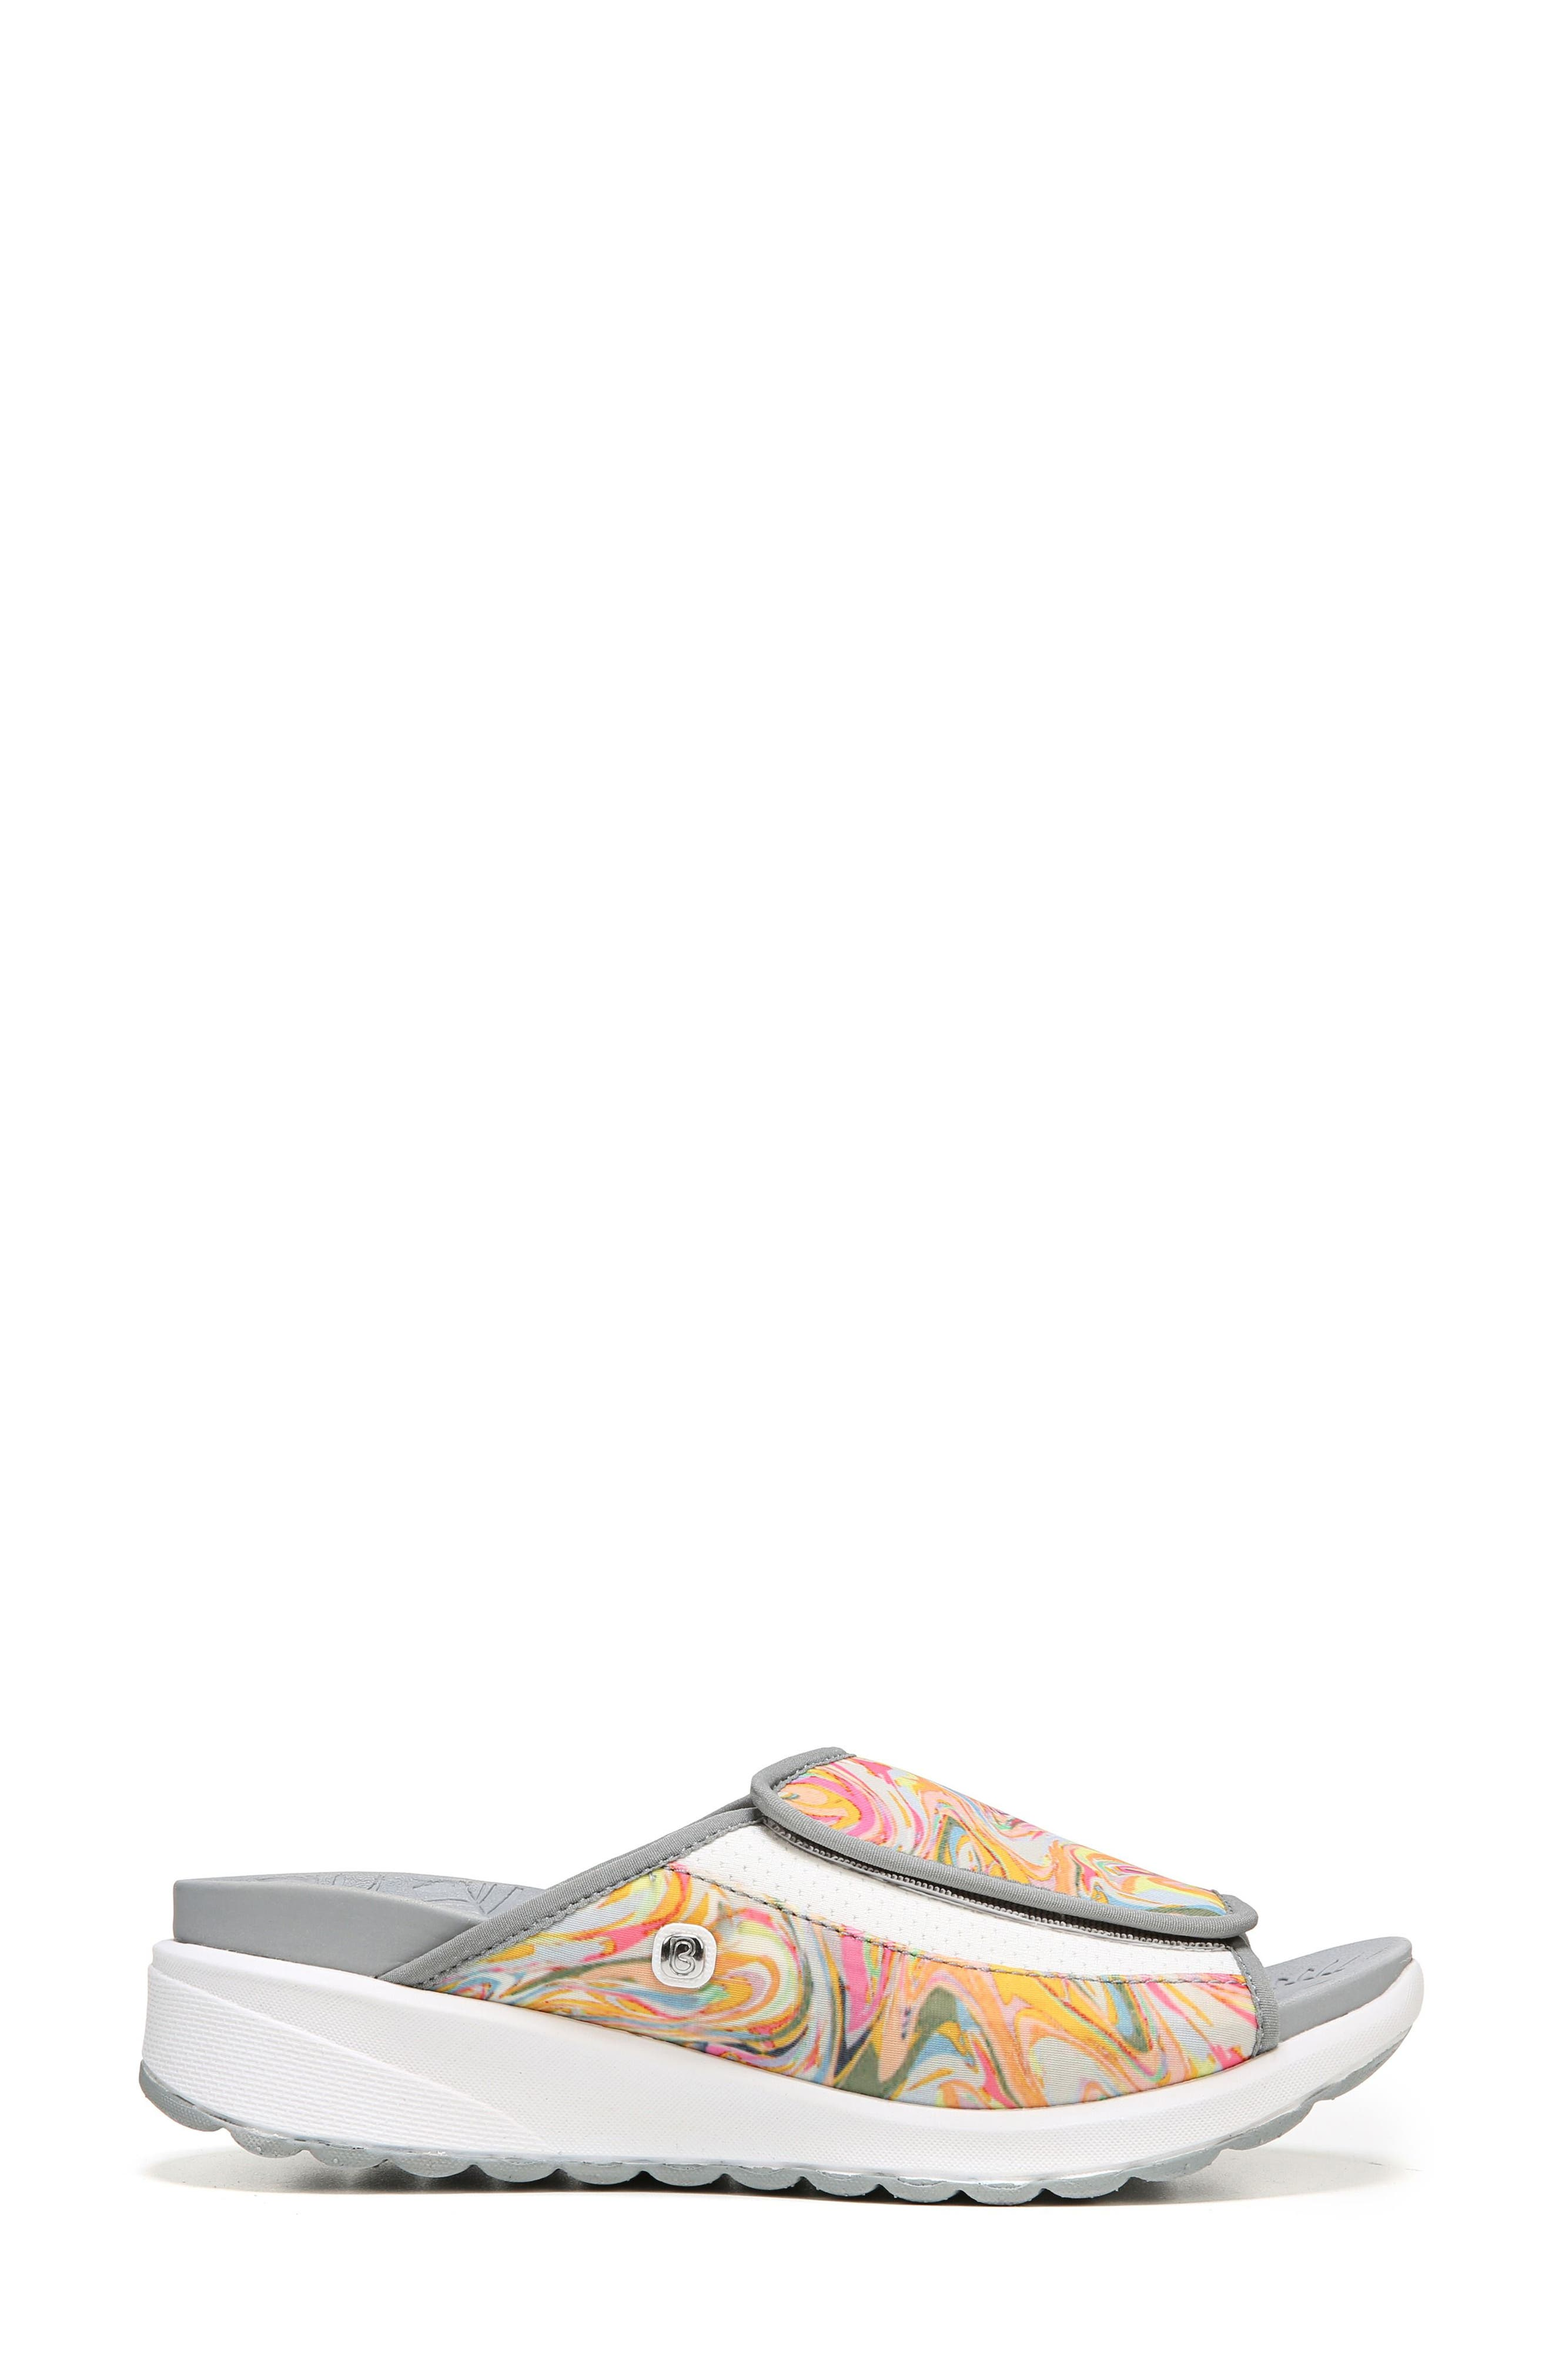 Galaxy Slide Sandal,                             Alternate thumbnail 3, color,                             Lava Fabric